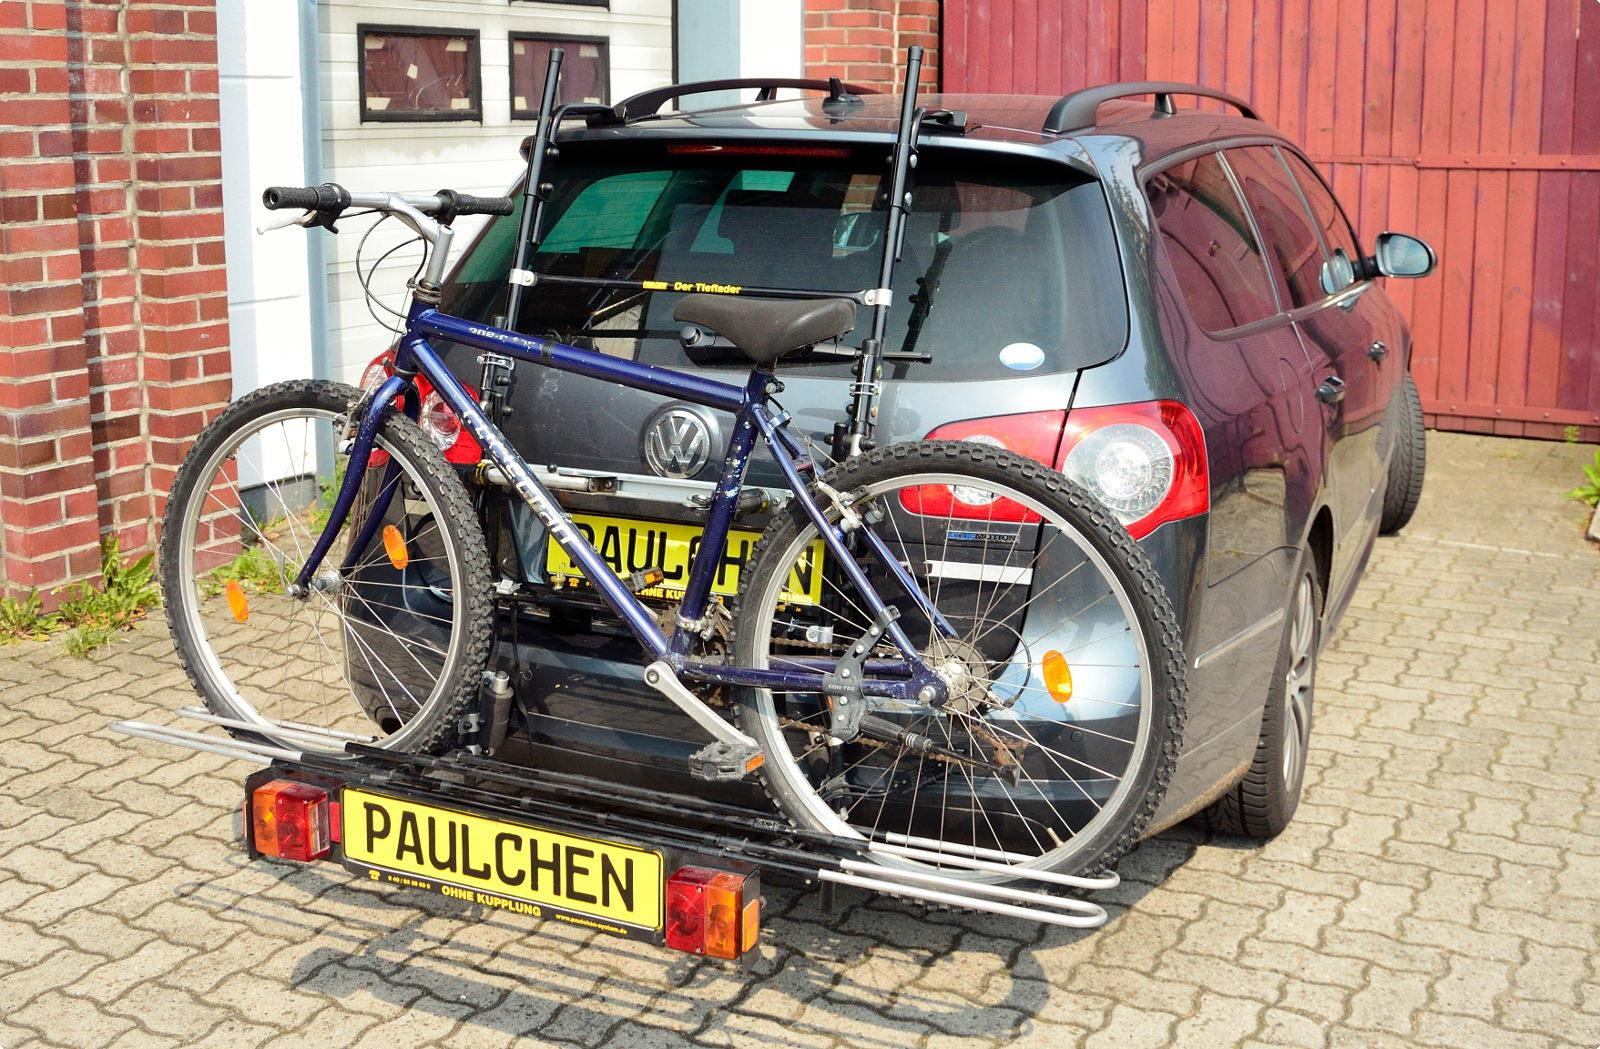 bike rack for vw passat variant b6 3c paulchen hecktr ger system paulchen hecktr ger. Black Bedroom Furniture Sets. Home Design Ideas